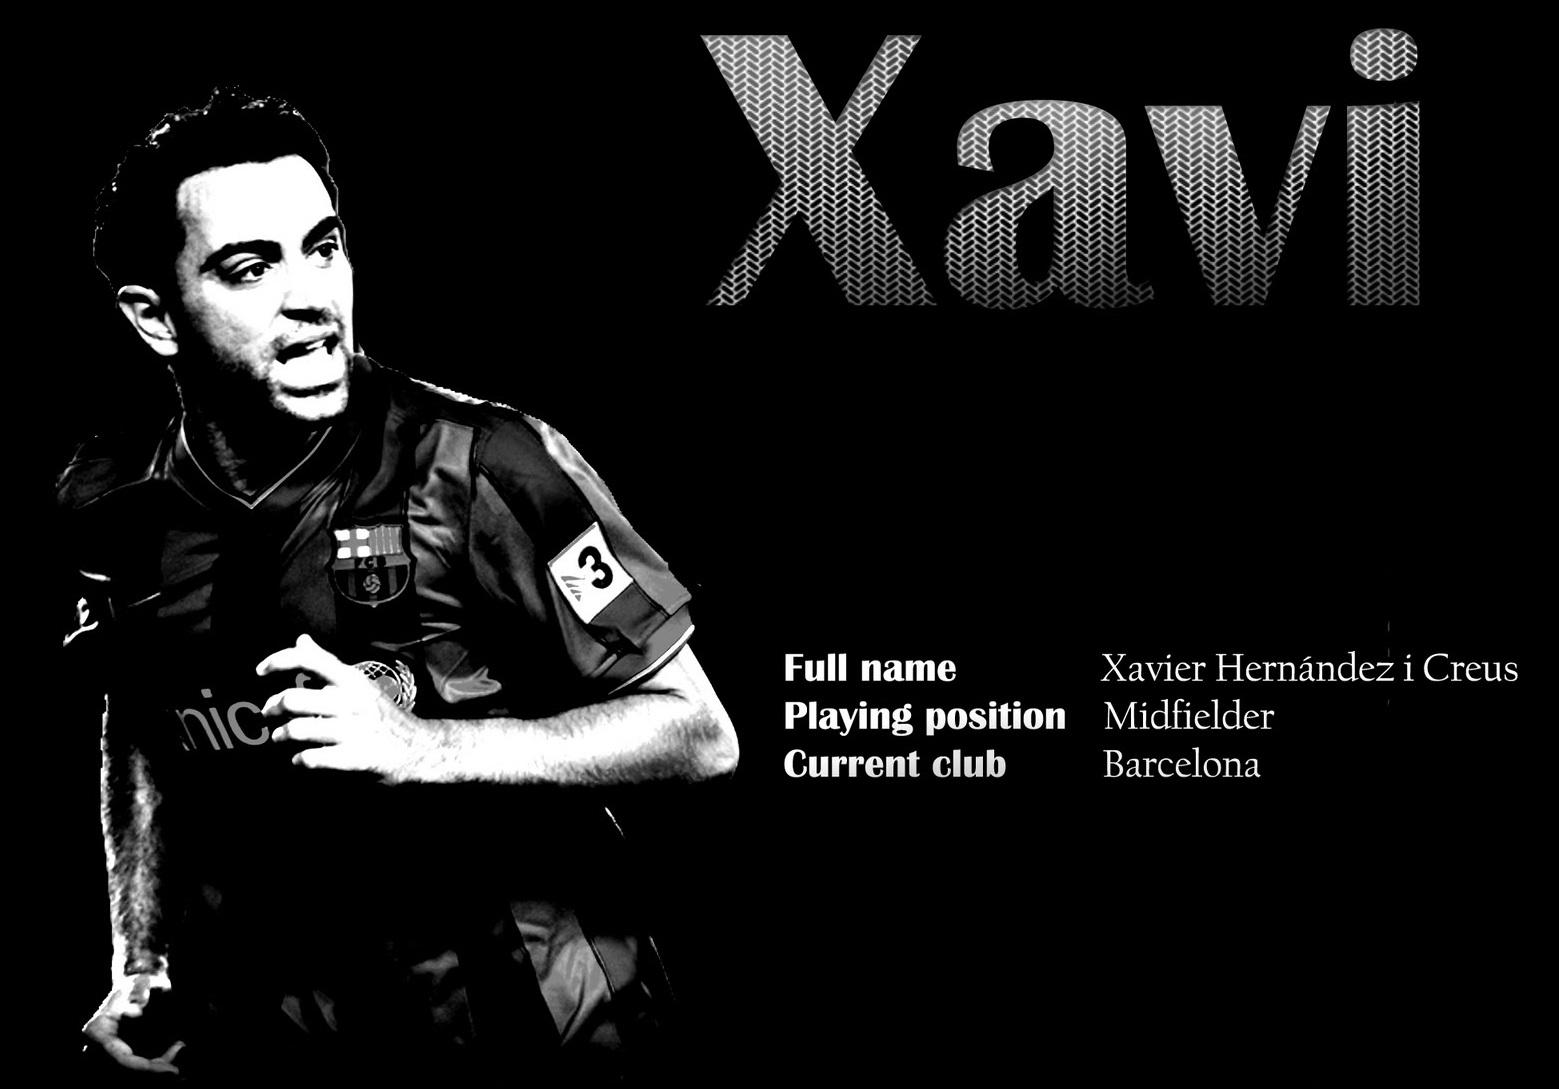 Xavi New HD Wallpapers 2013 2014 1559x1089